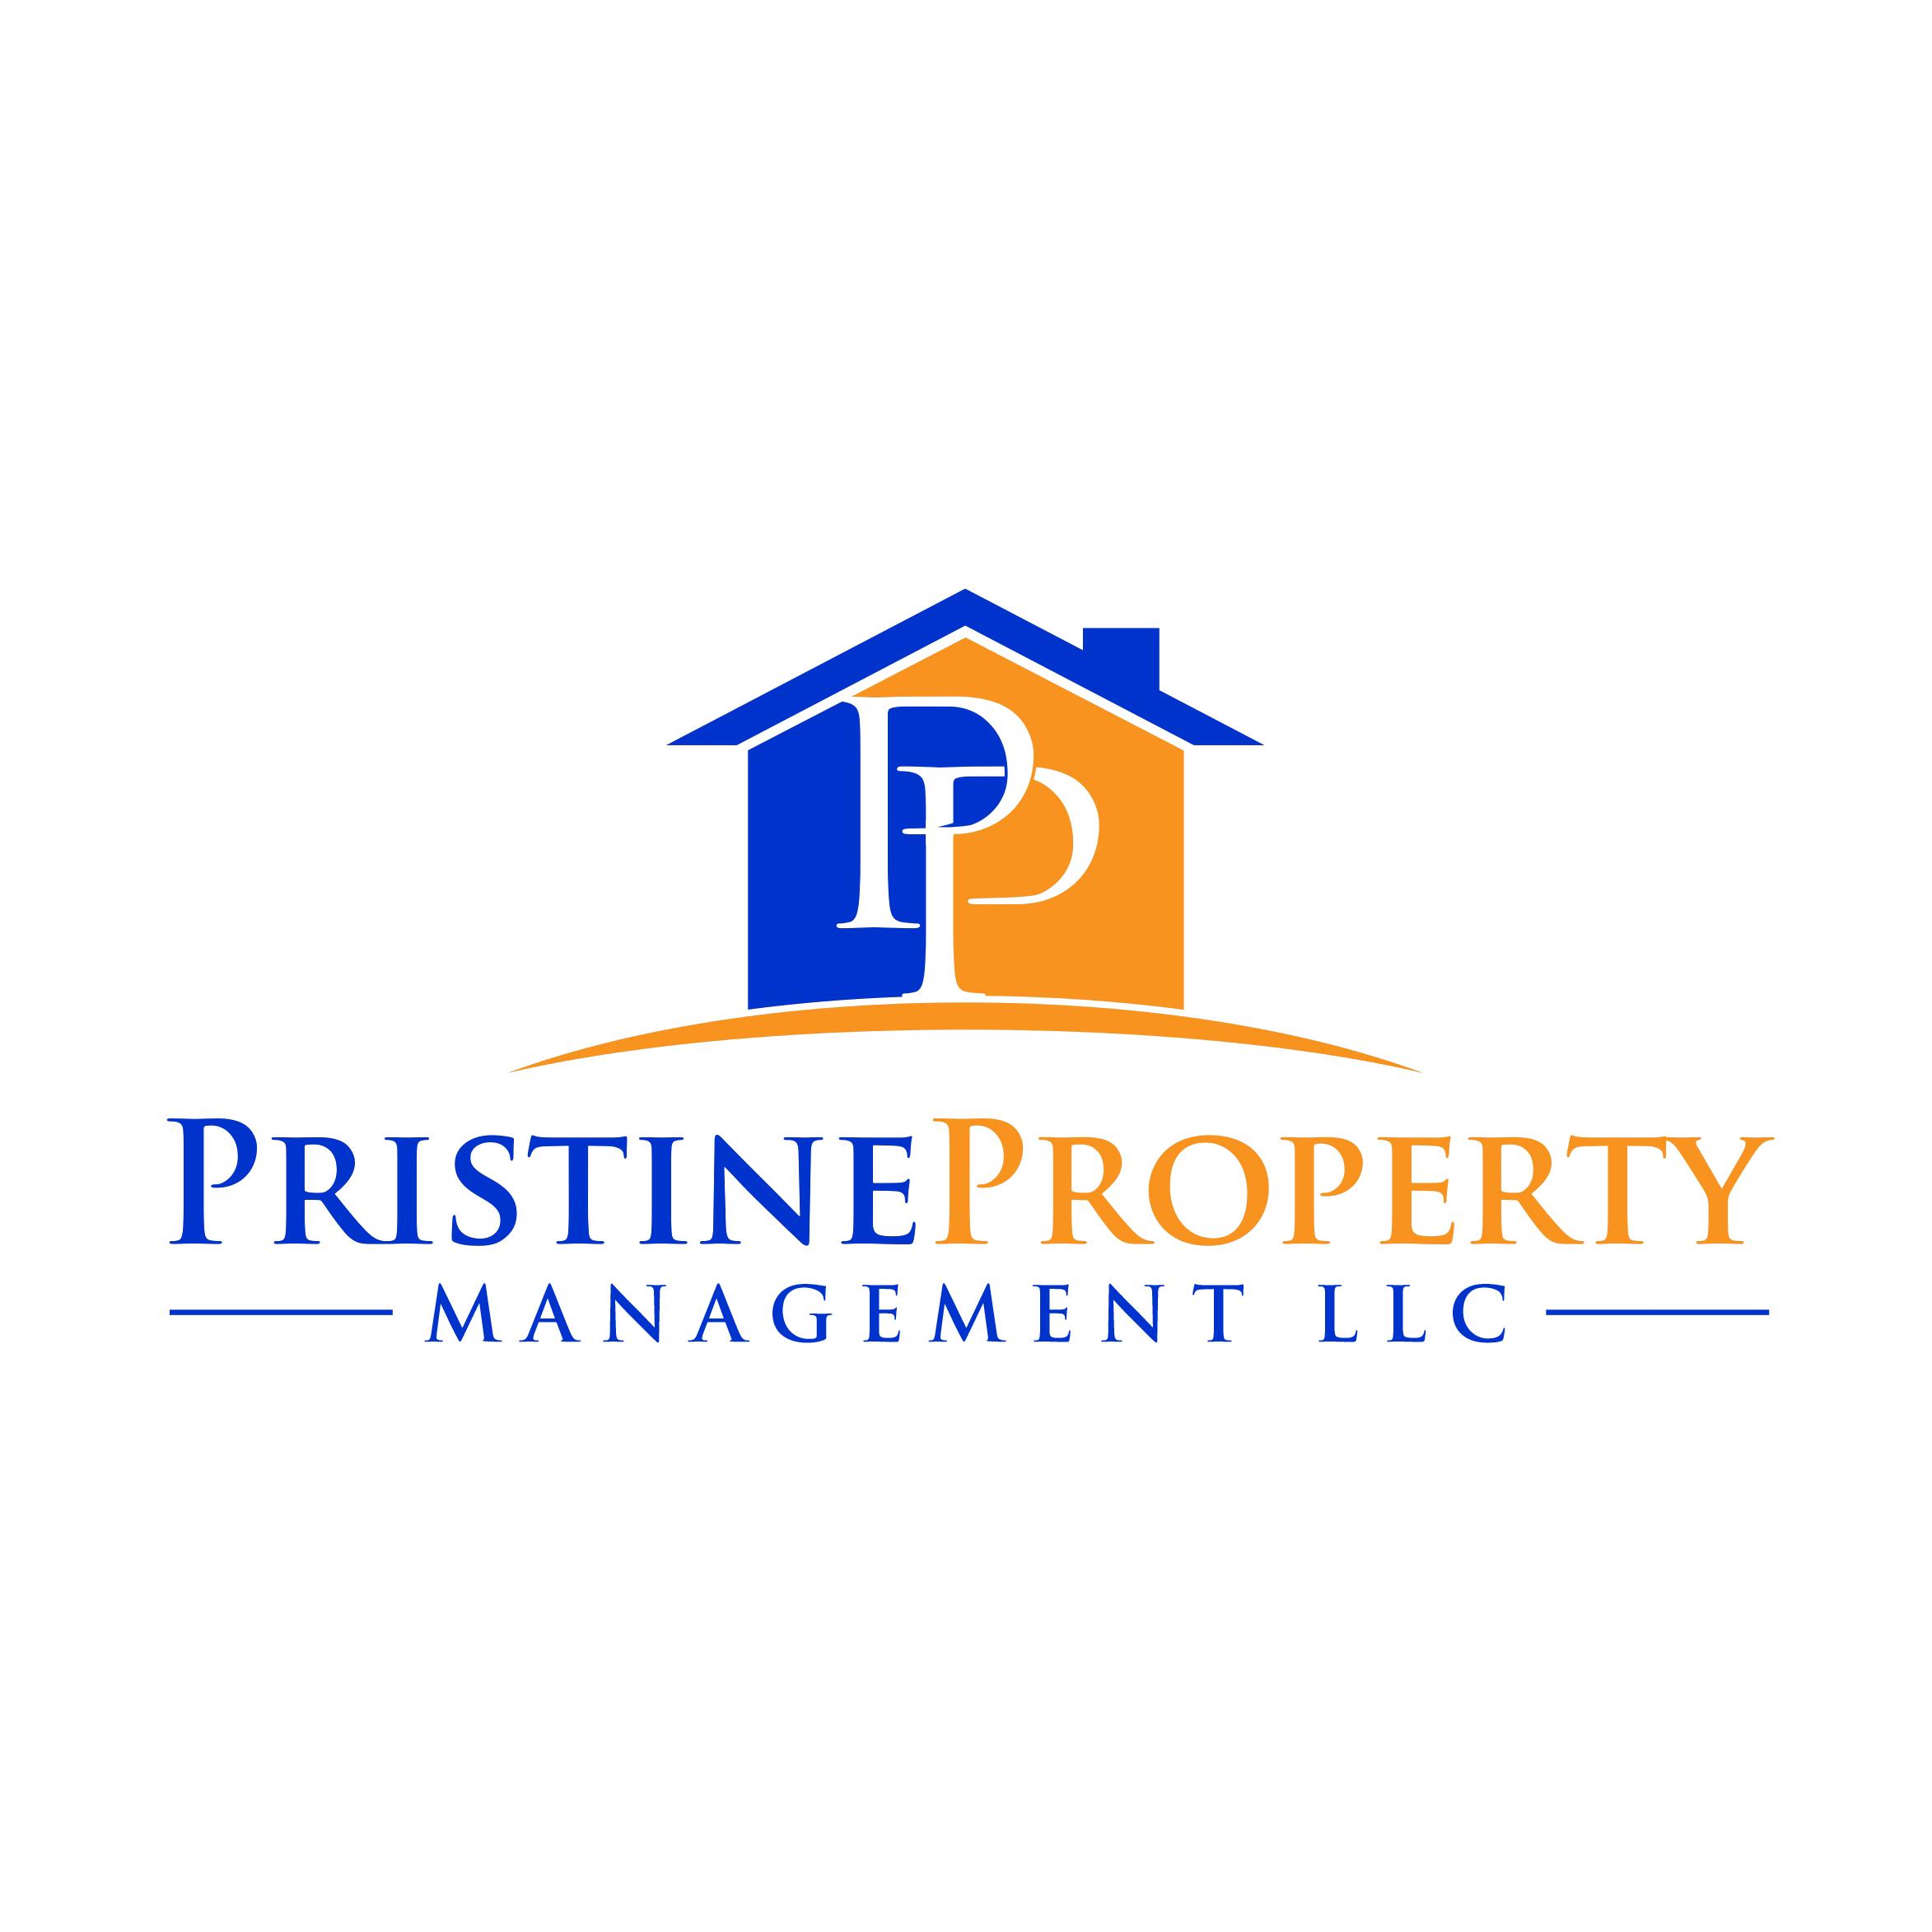 Pristine Property Management